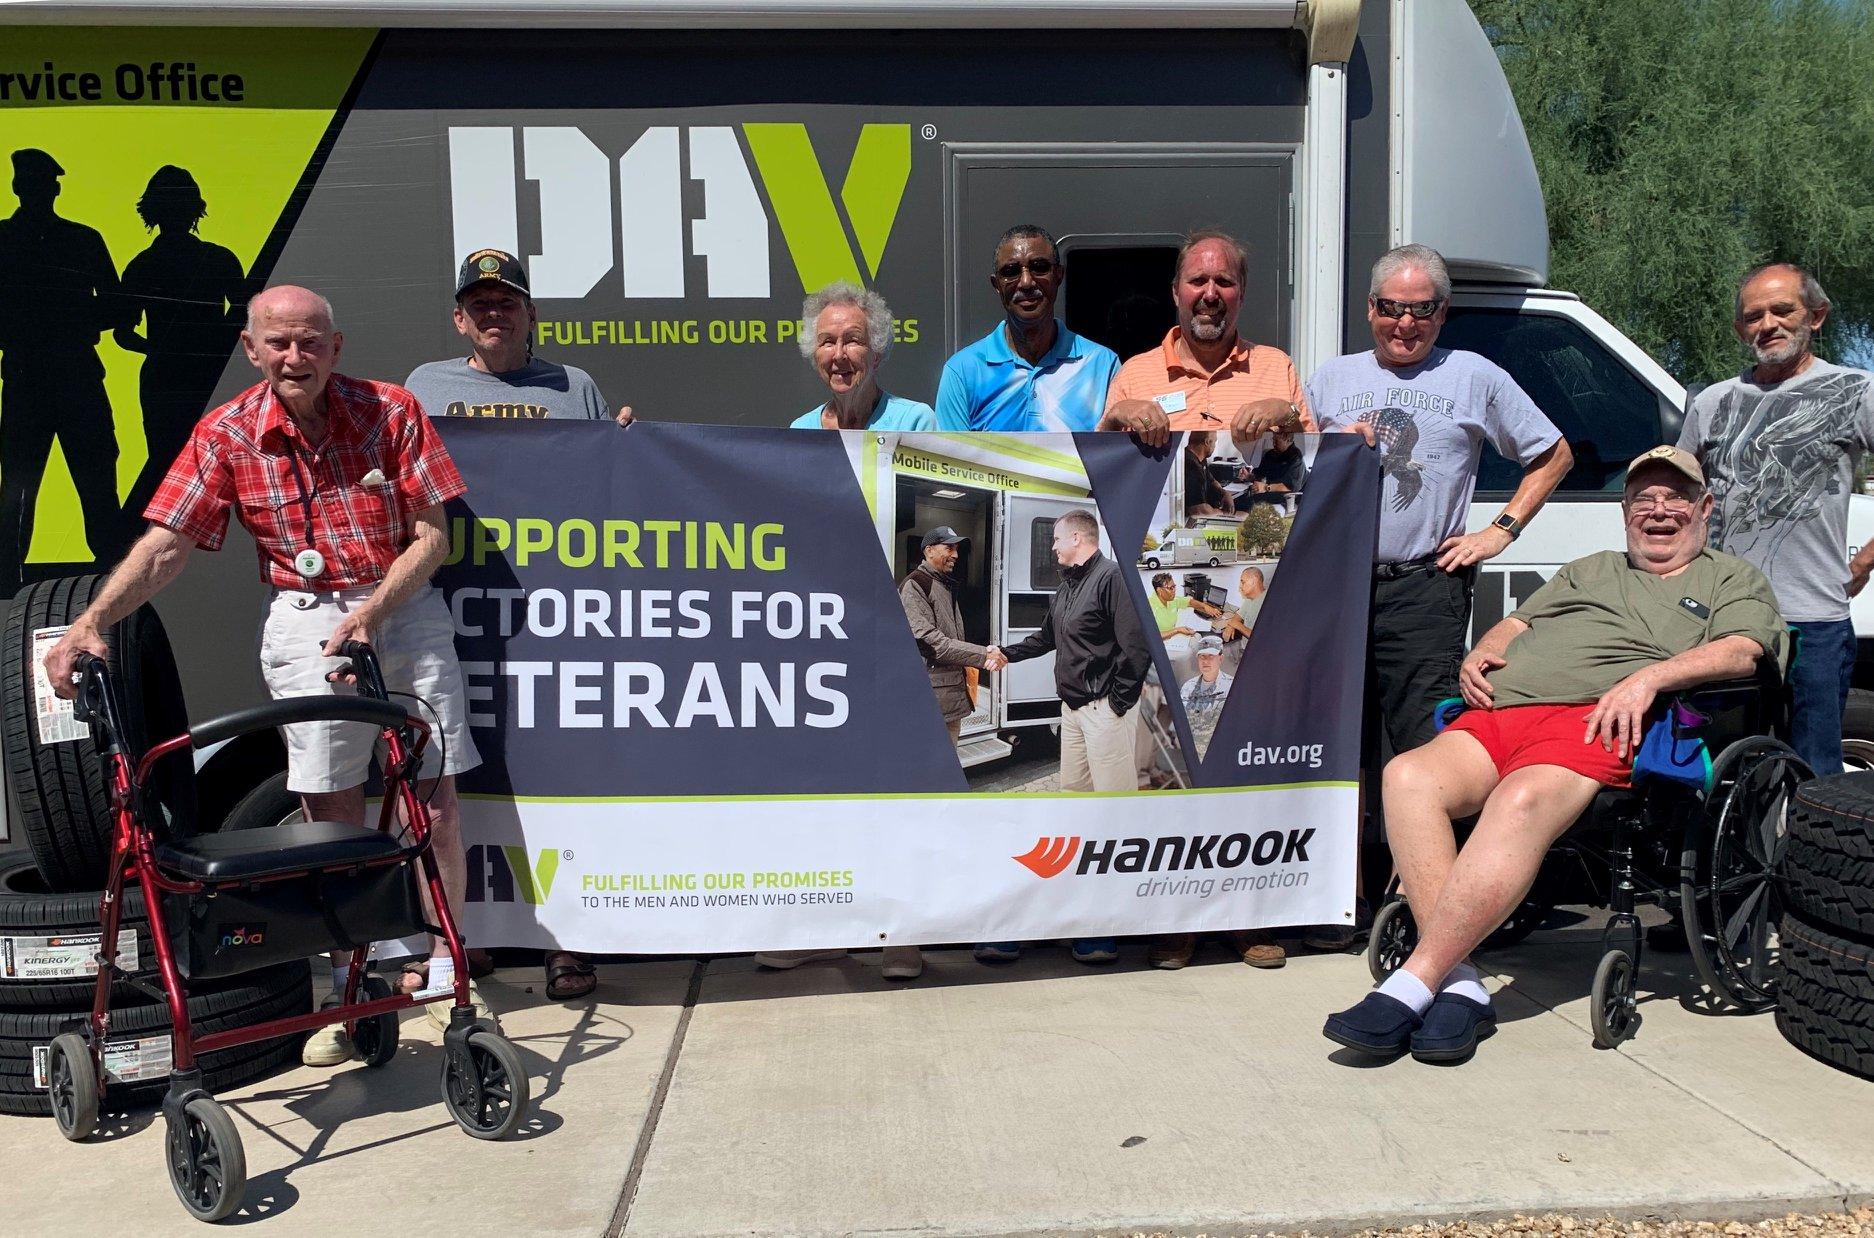 Hankook, Dealers Host Events for Disabled Veterans